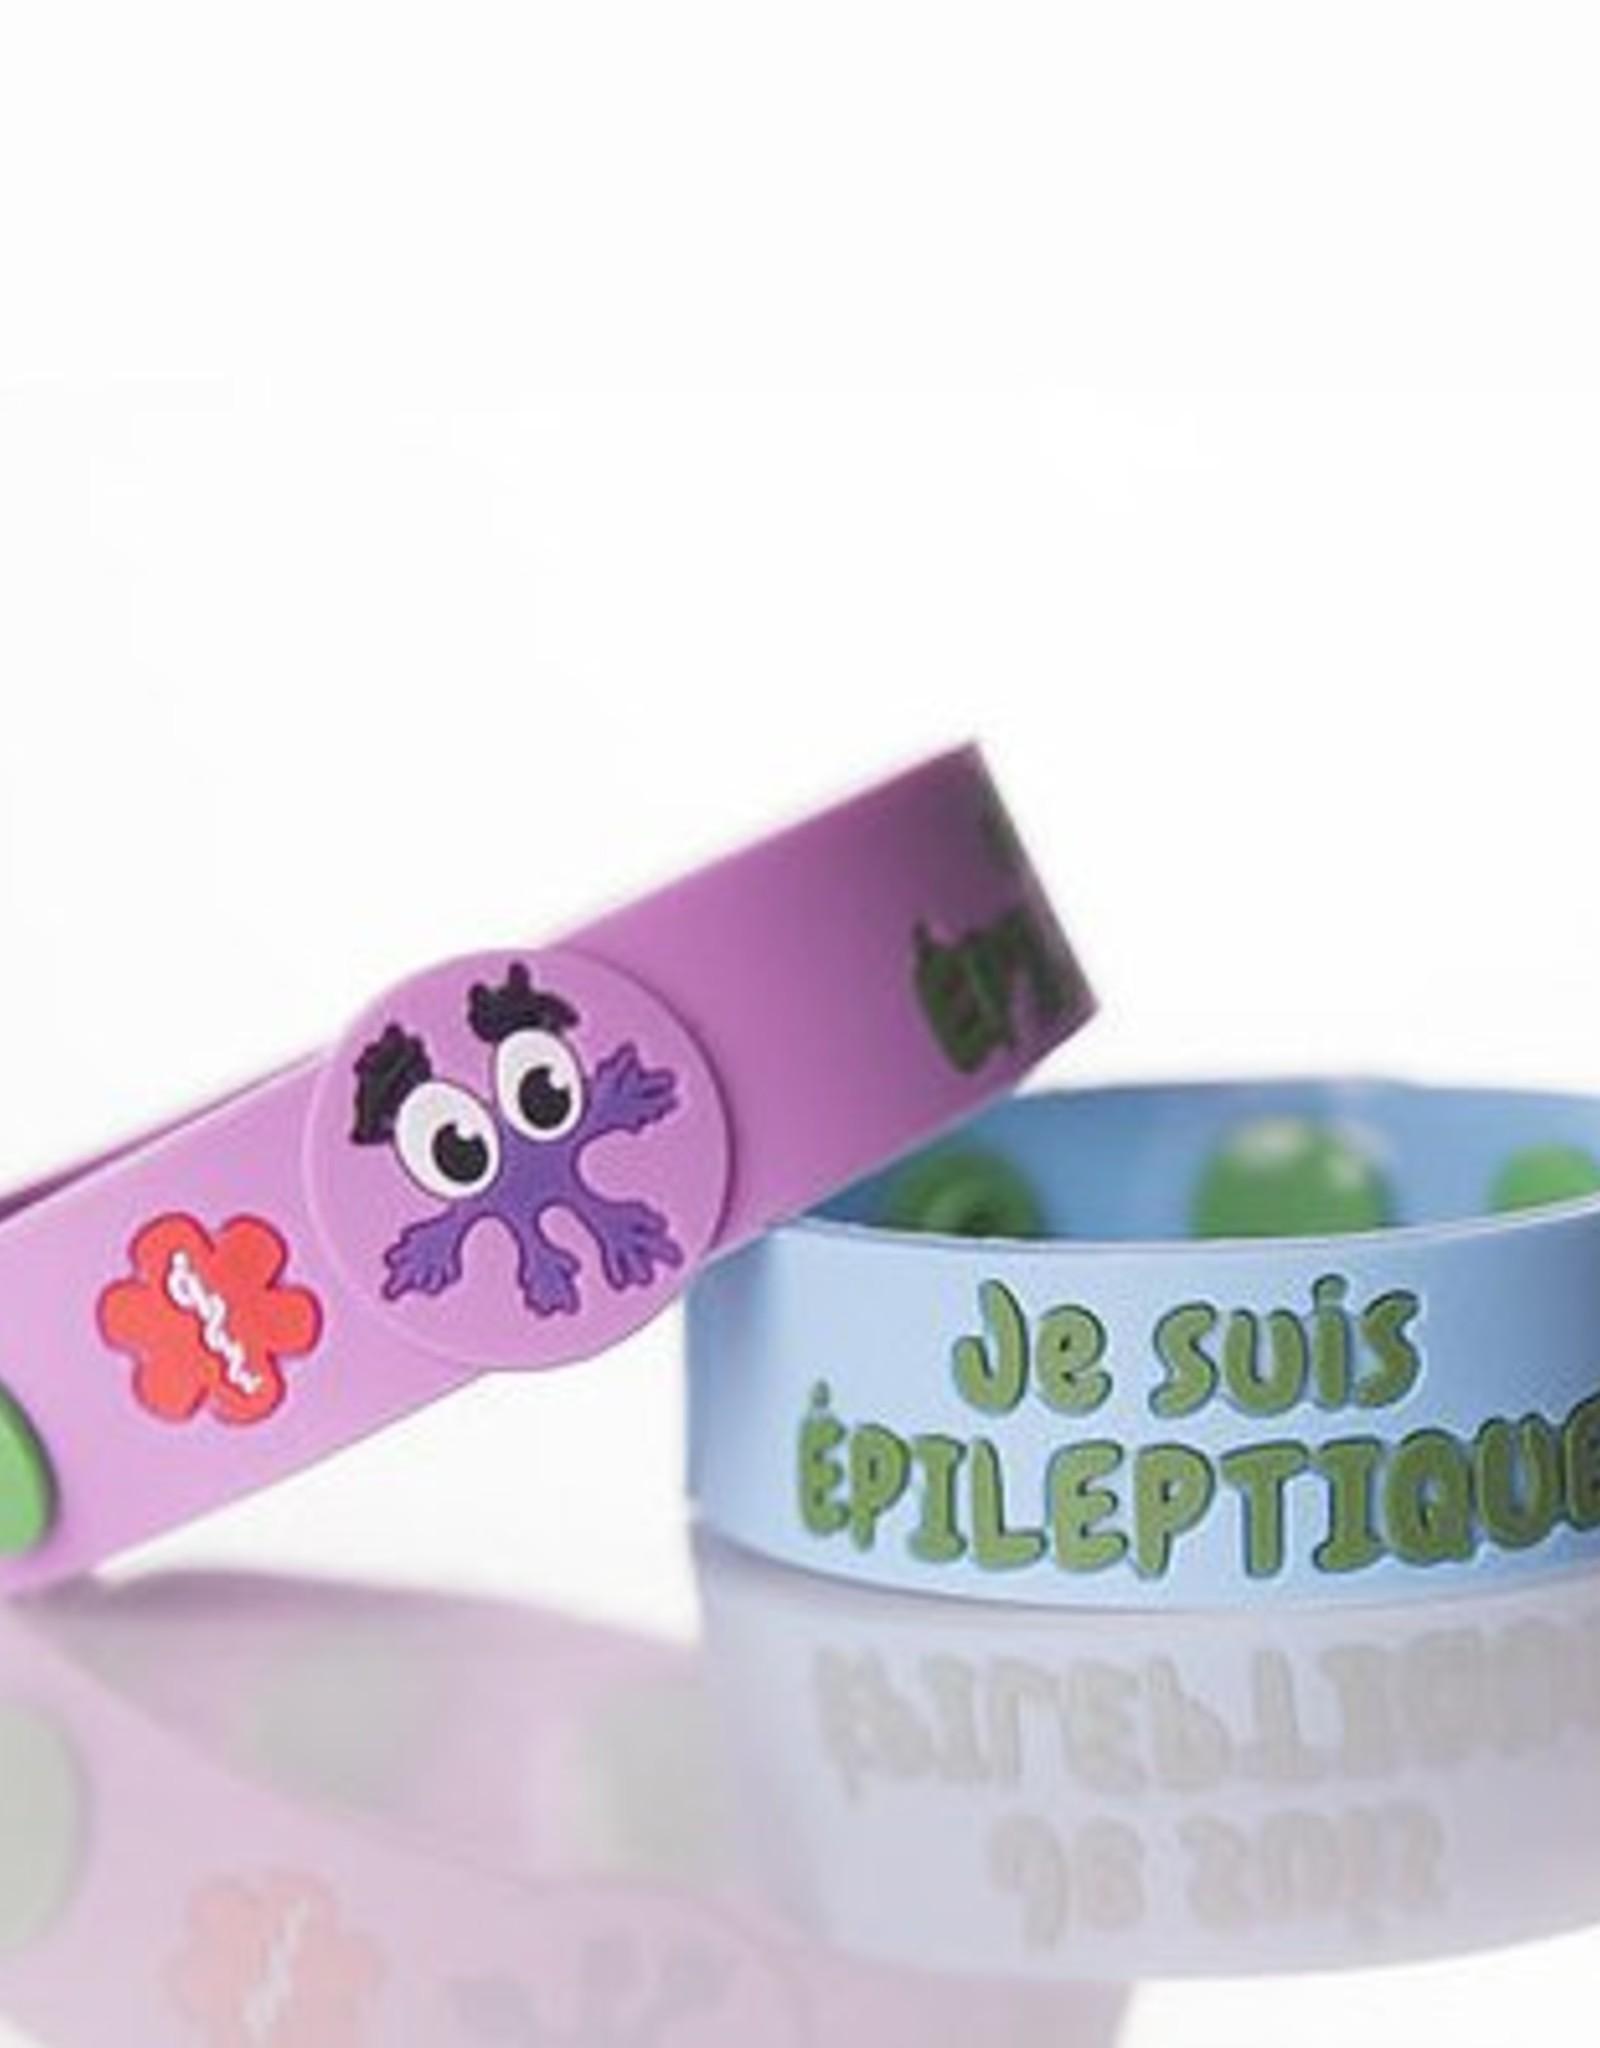 Secallergies Bracelet d'allergie : Épileptique